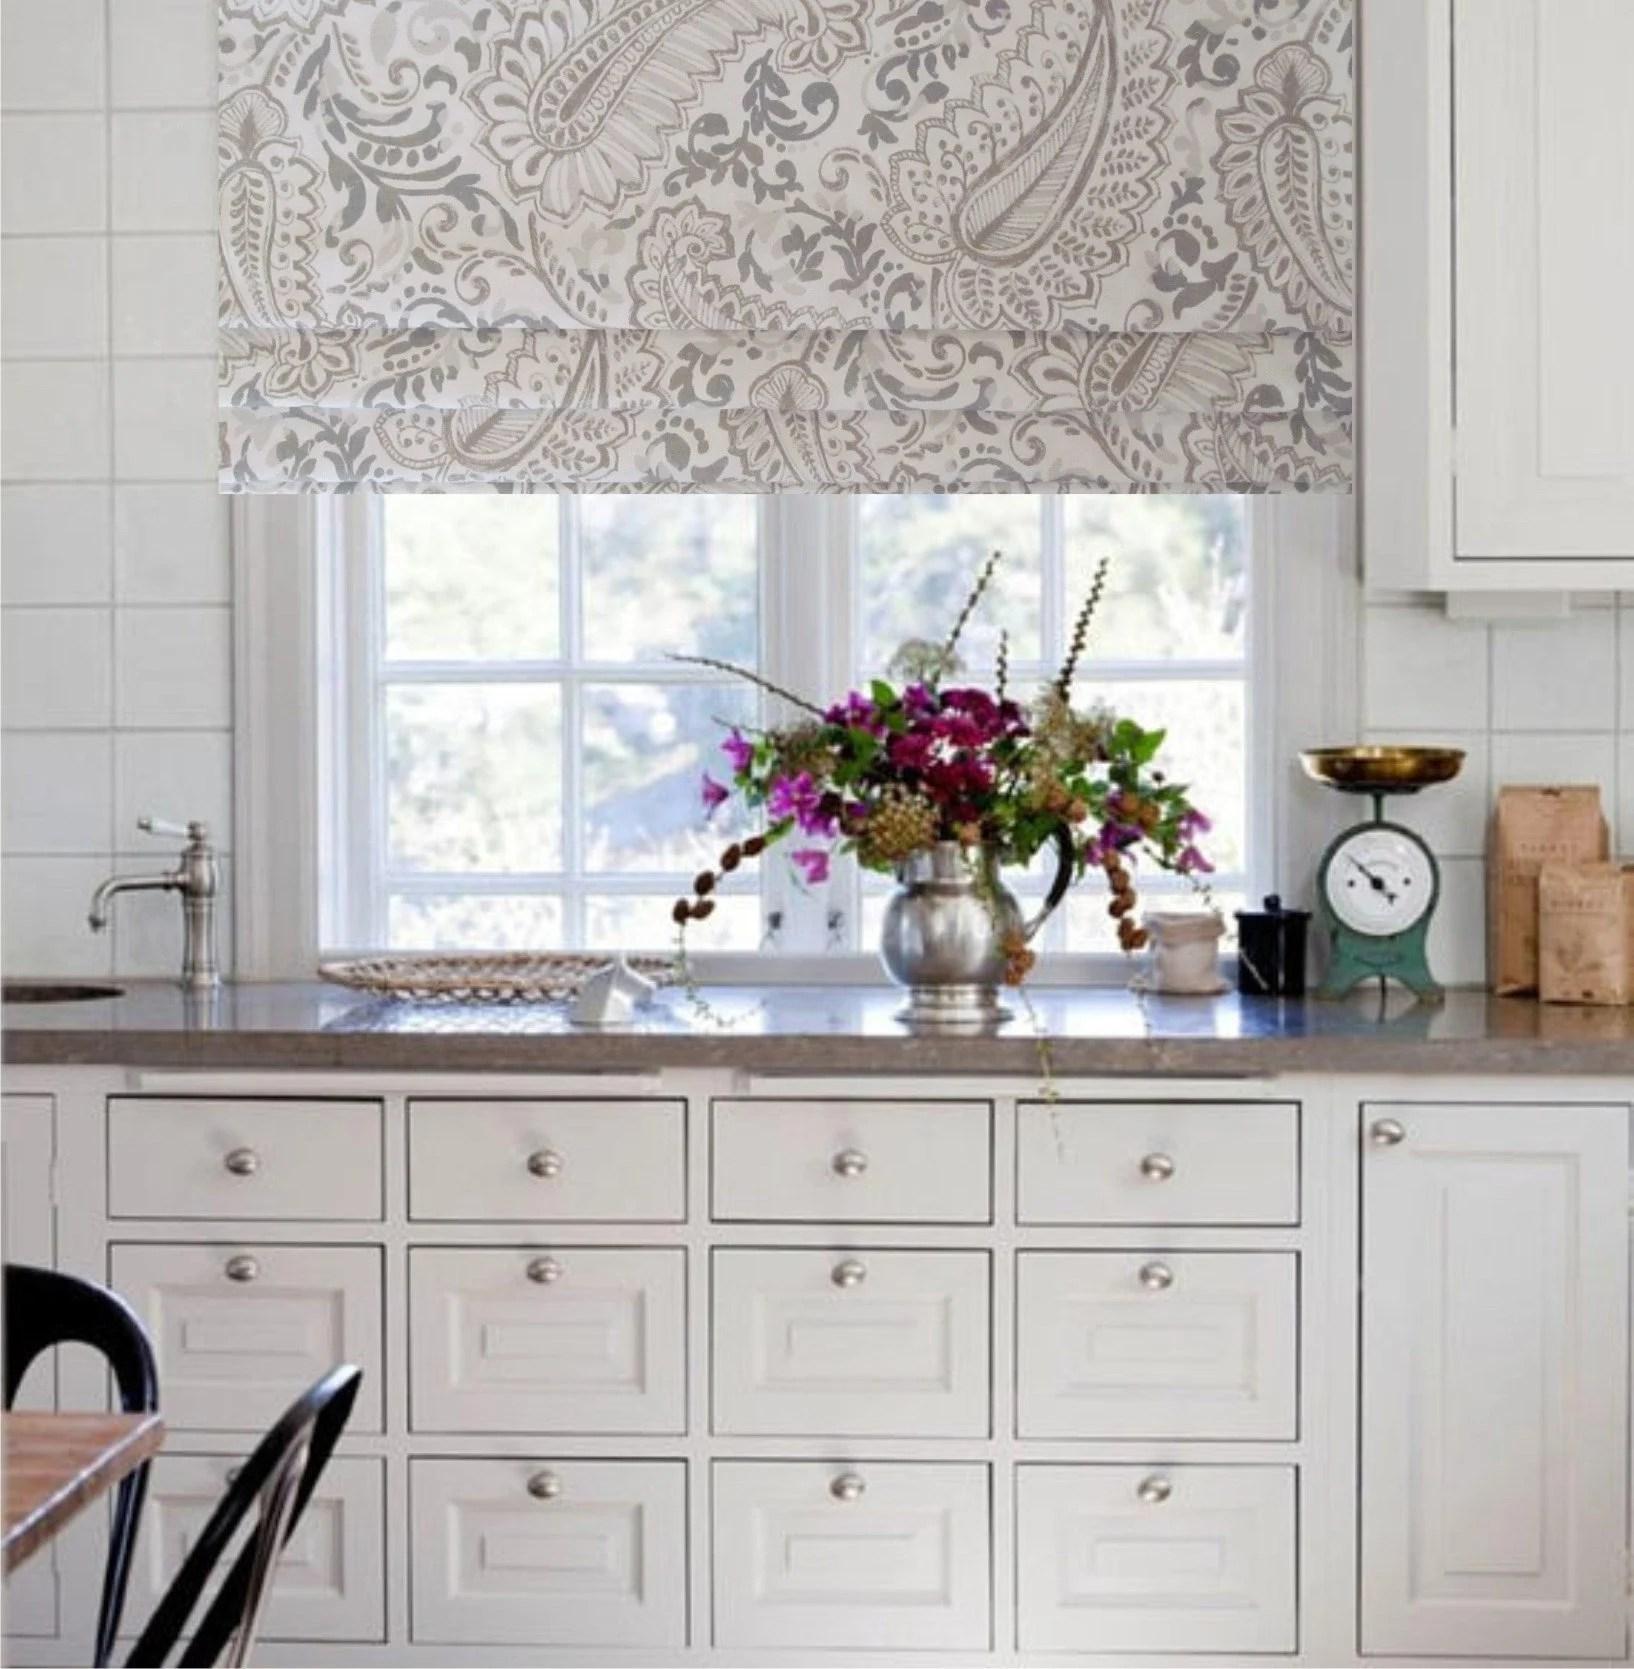 kitchen shades building wall cabinets custom roman shade etsy paisley faux lined mock valance fake shannon ecru sizing available